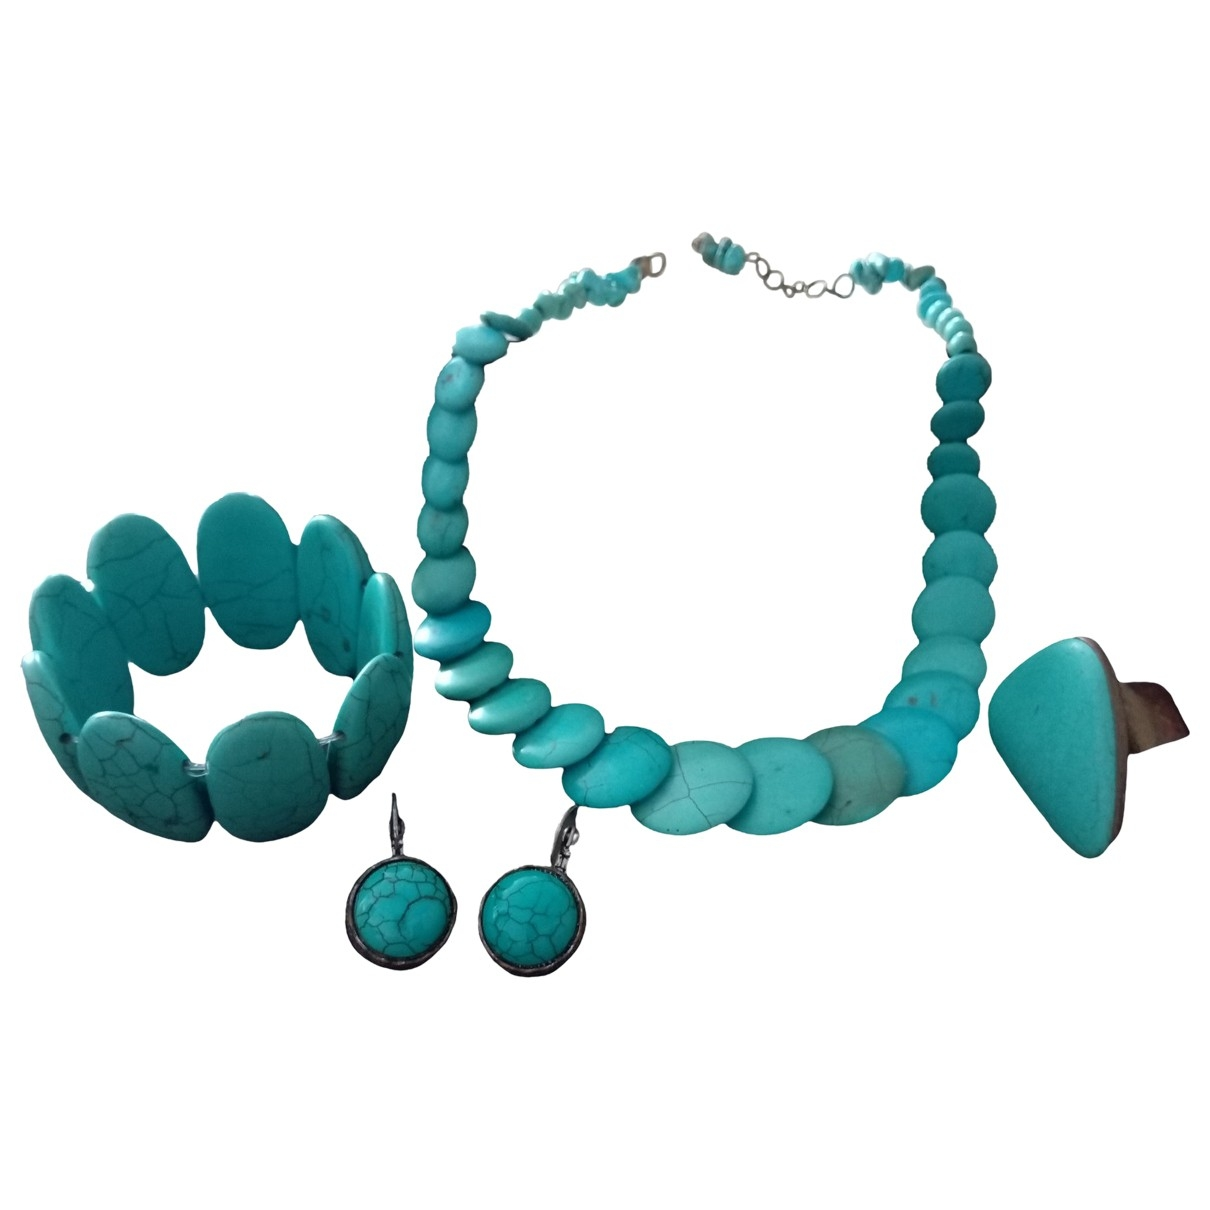 Non Signe / Unsigned Turquoises Schmuck-set in  Tuerkis Perlen